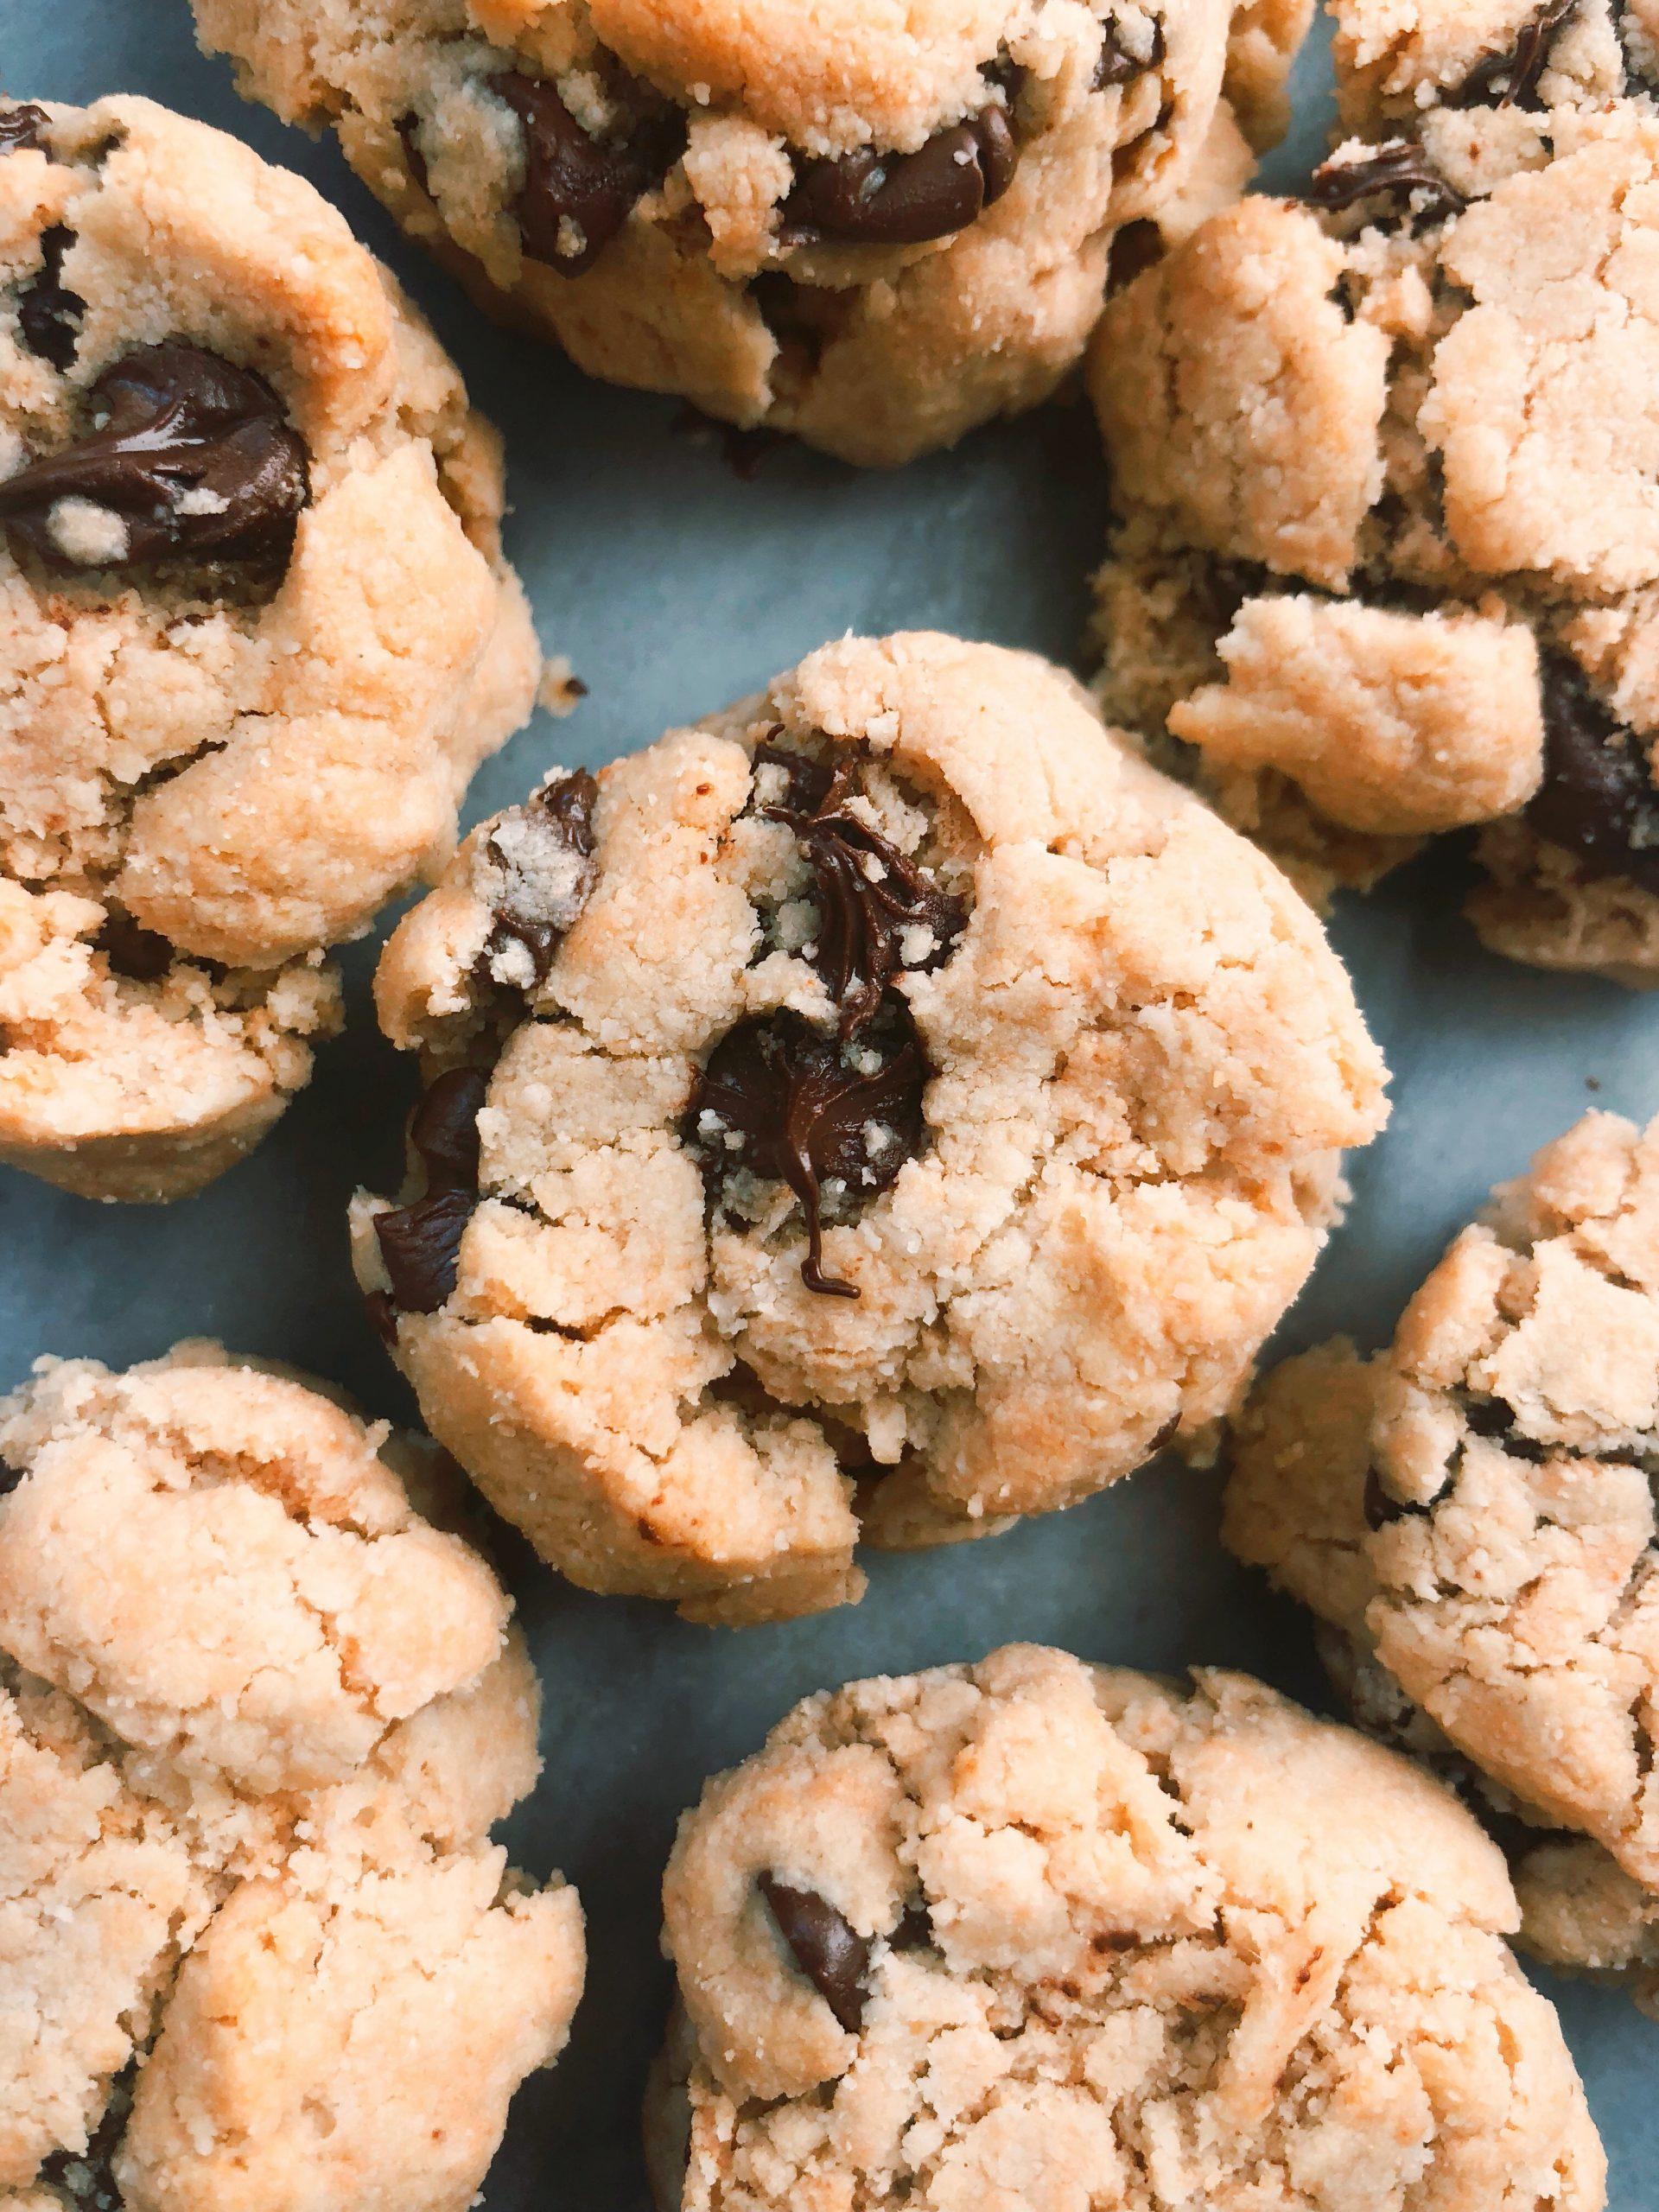 Best D*mn Vegan Chocolate Chip Cookies